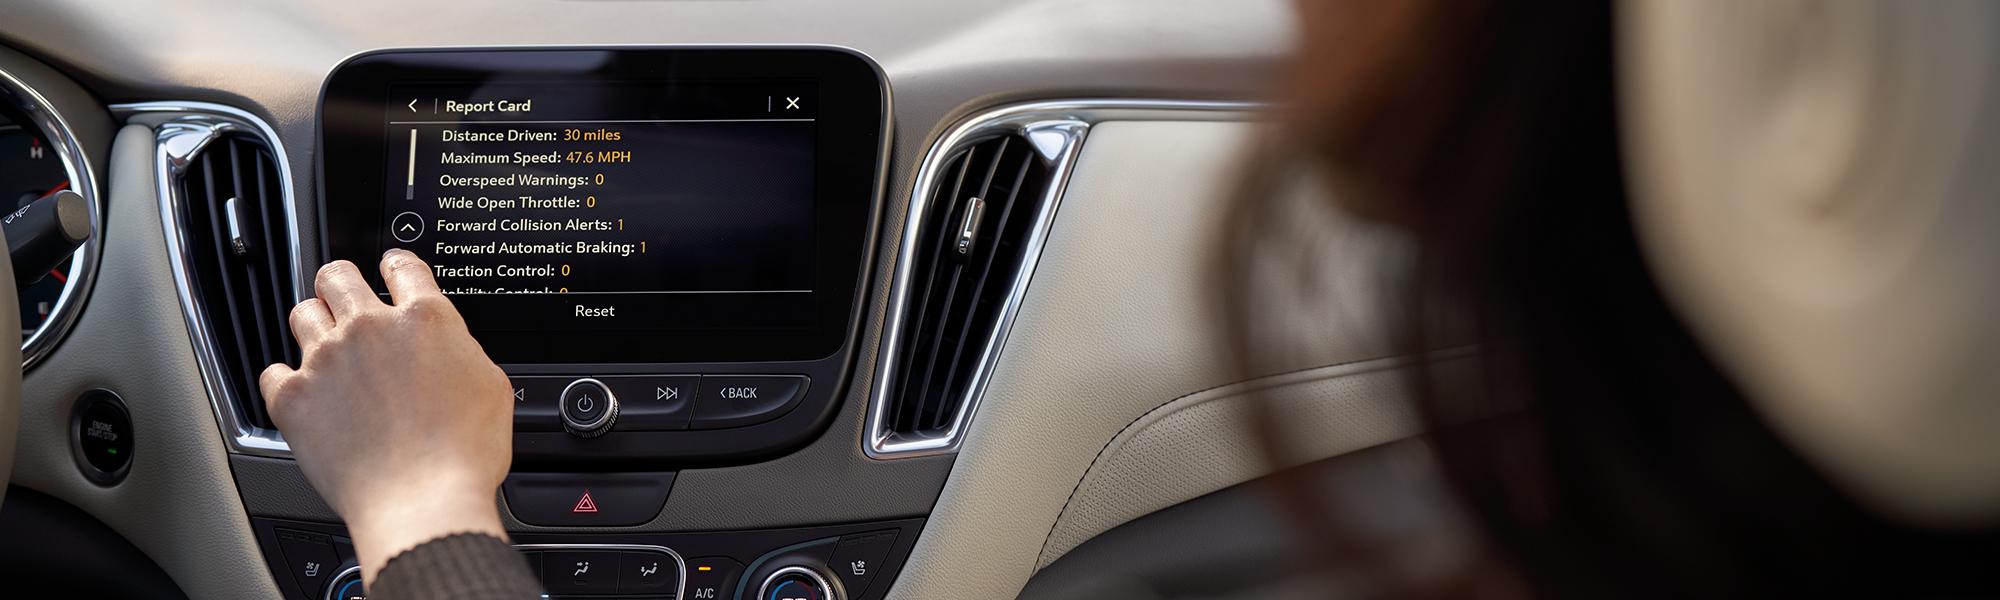 2020 Chevy Malibu interior